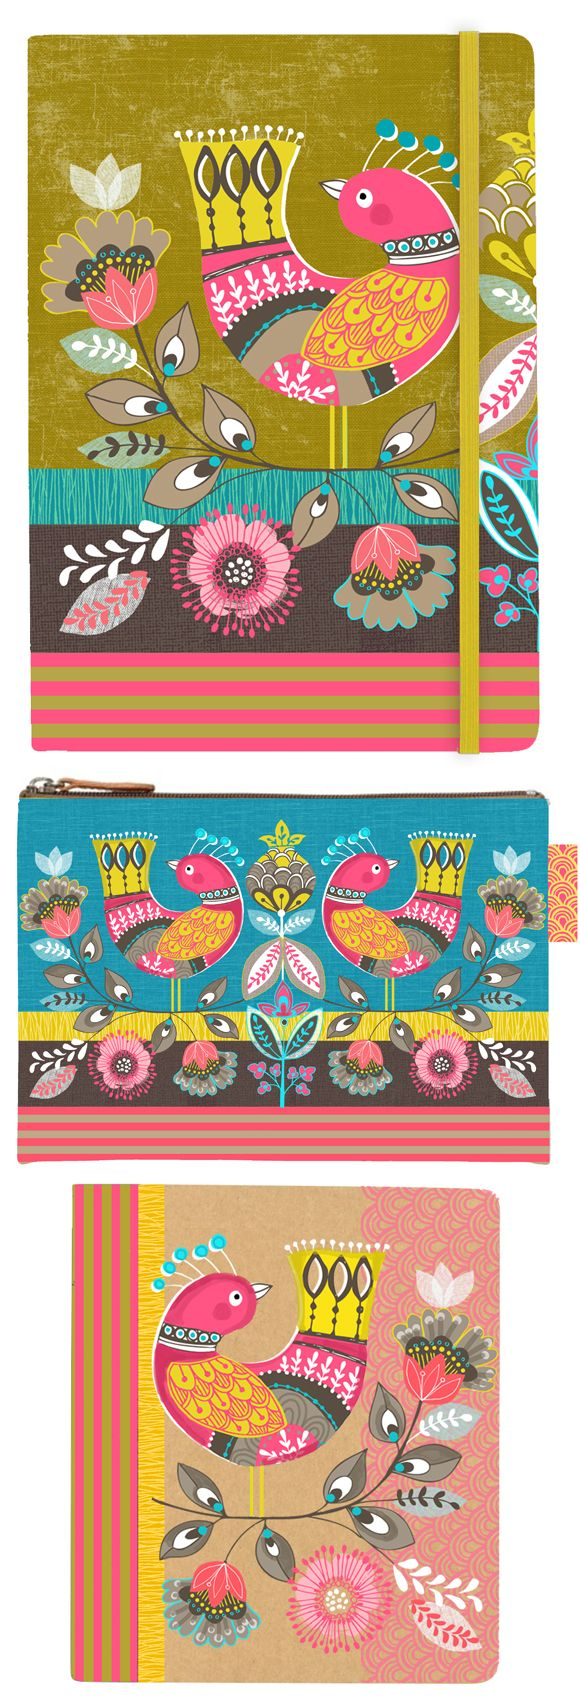 wendy kendall designs – freelance surface pattern designer » paradise birds